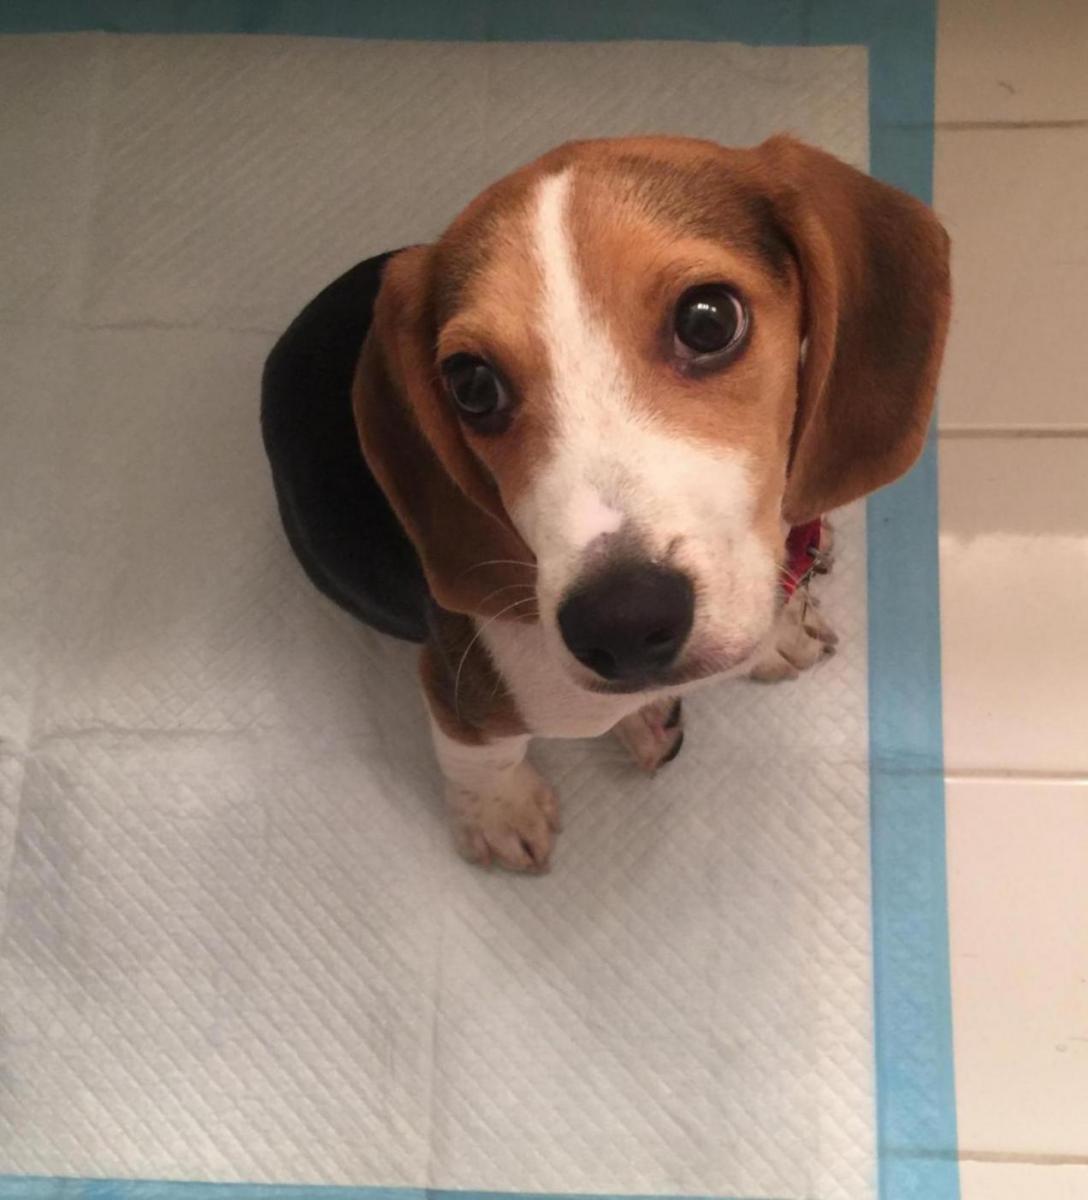 Newbie Beagle Owner-9365a465-c7f4-440d-a427-224fe427db73_1564925020282.jpg